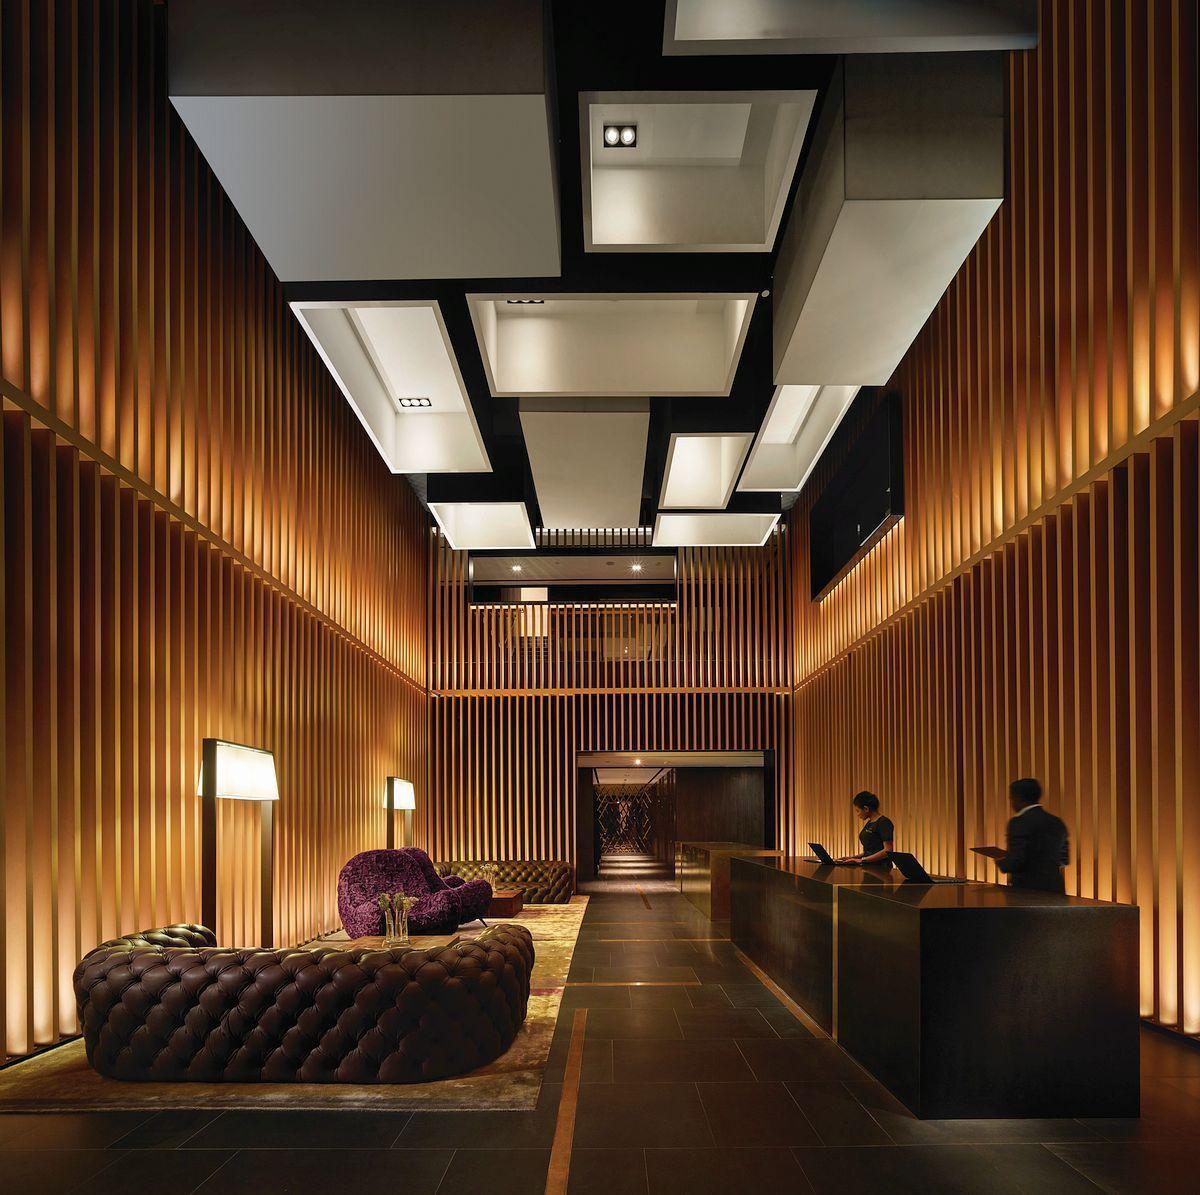 G hotel kelawai malaysia with its exquisite luxury